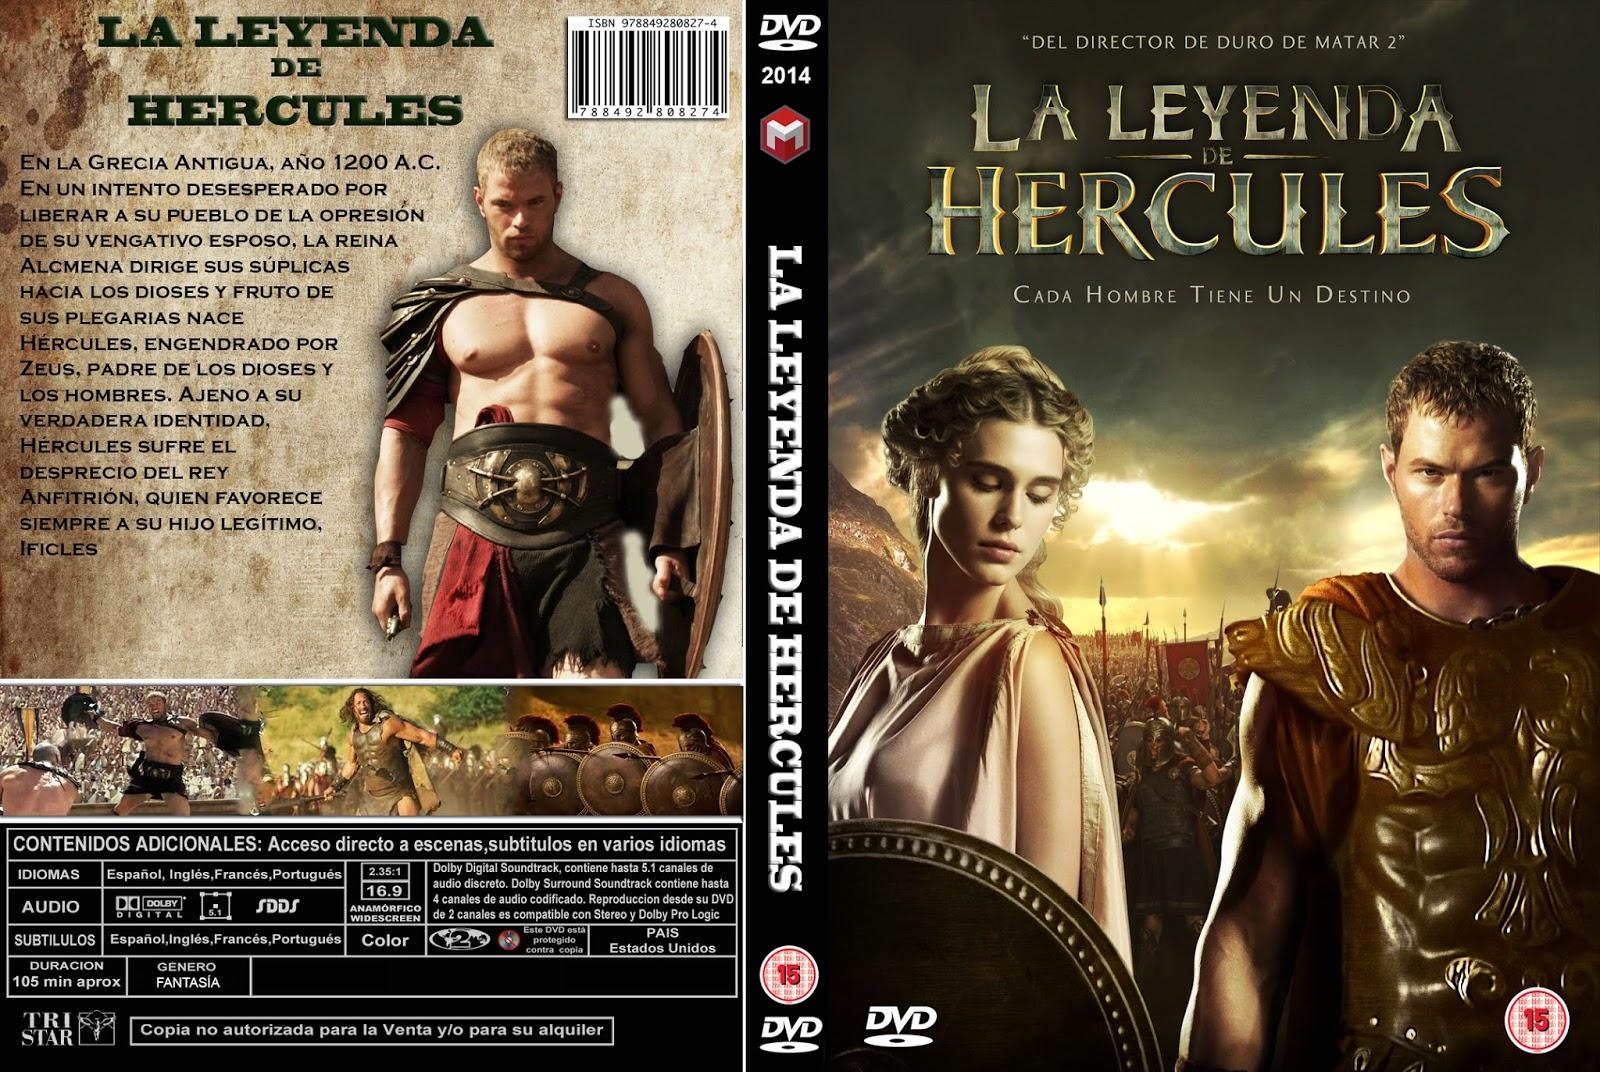 Hercules Dvd Cover images